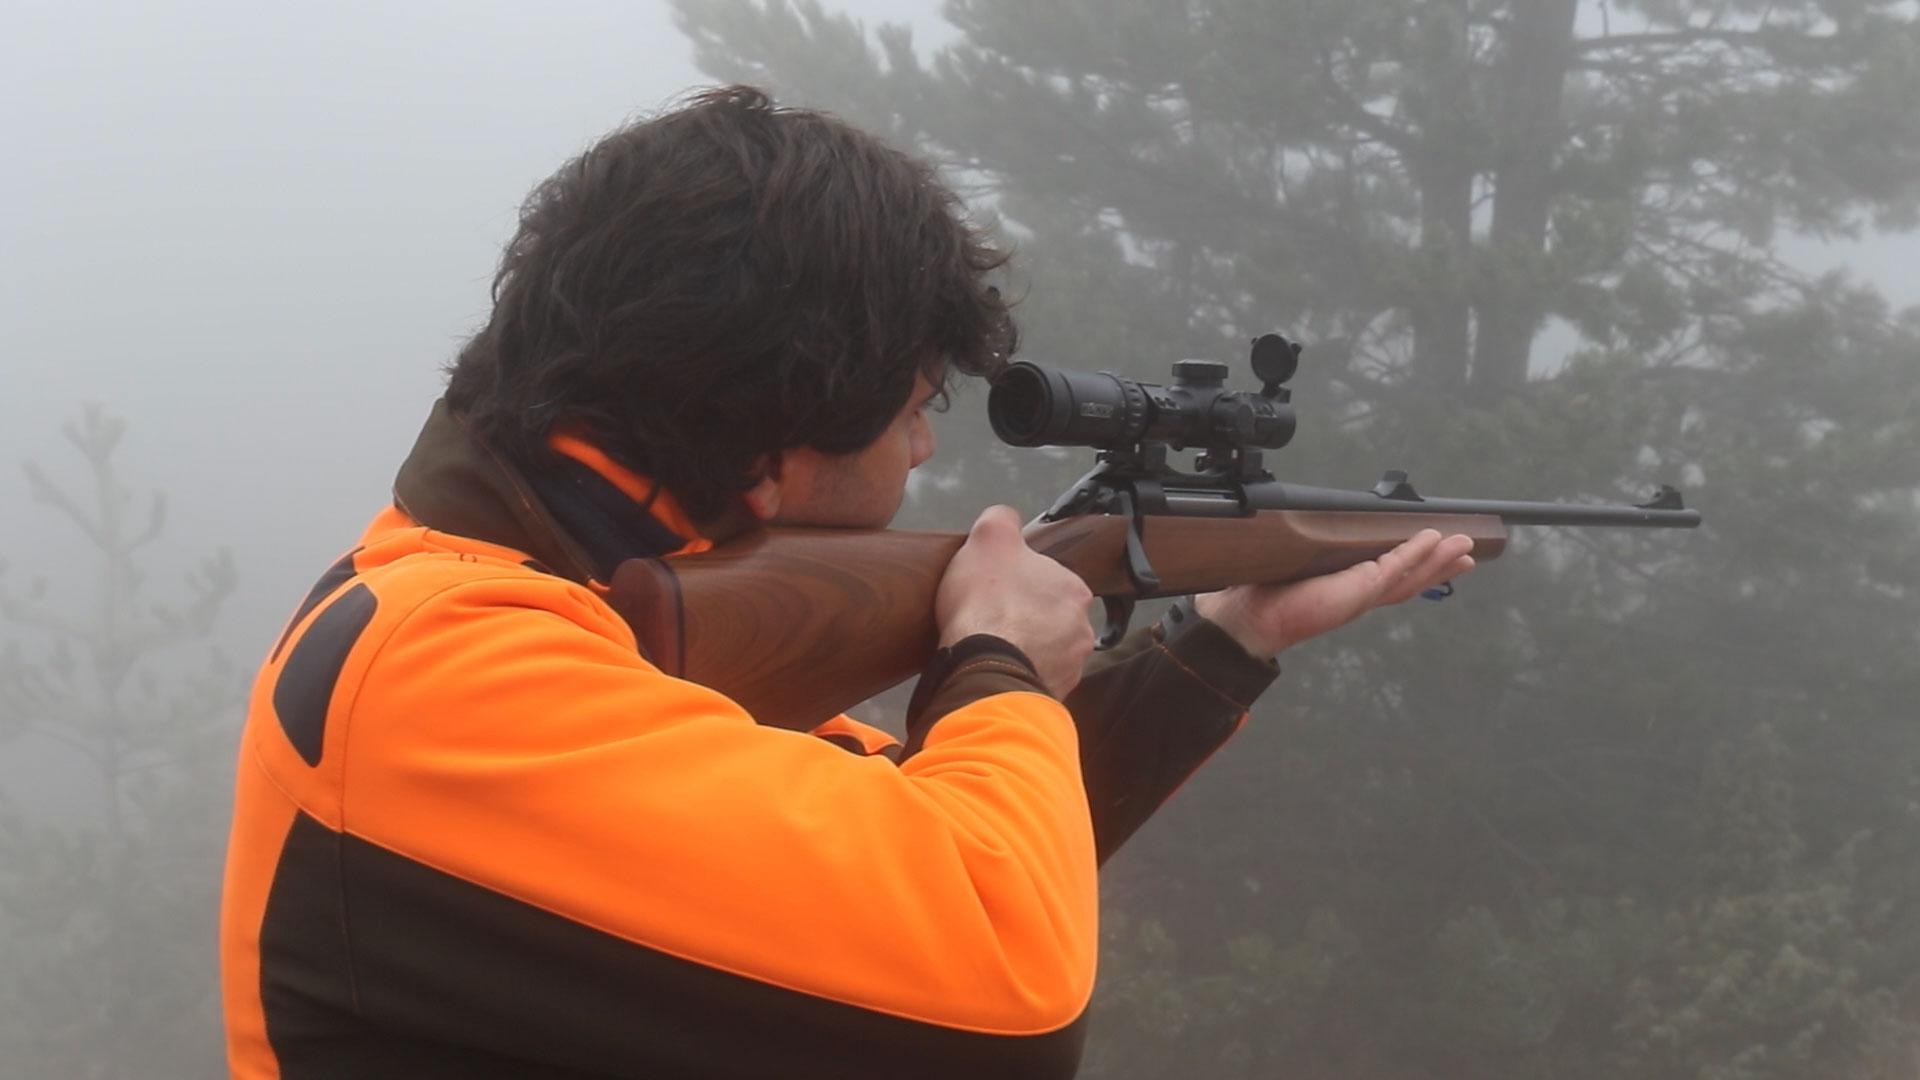 ottica per carabina bolt action da caccia al cinghiale in battuta konus